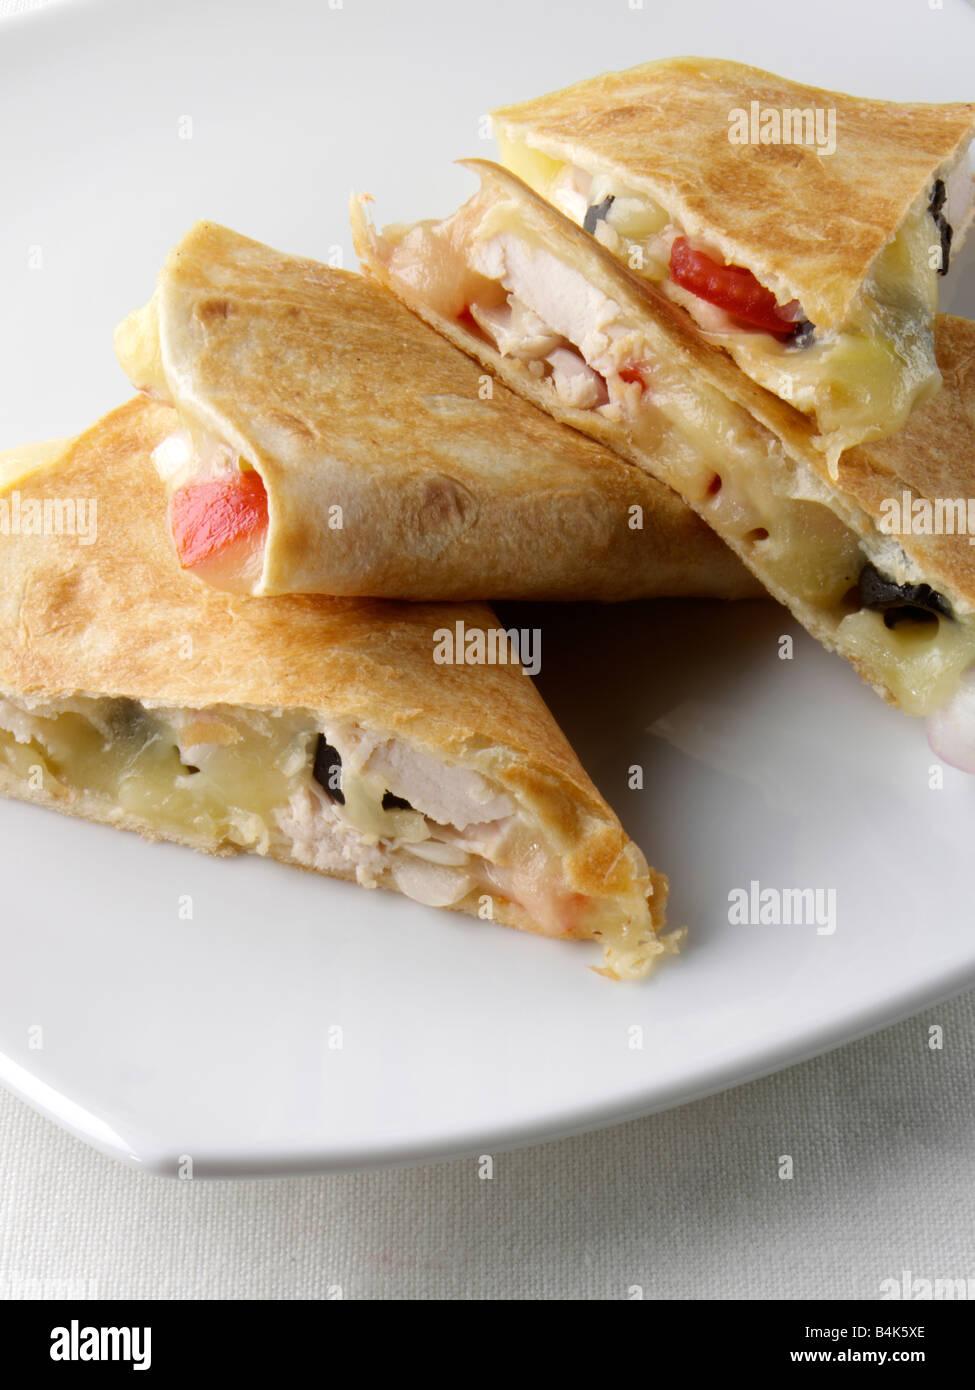 Chicken quesadillas - Stock Image